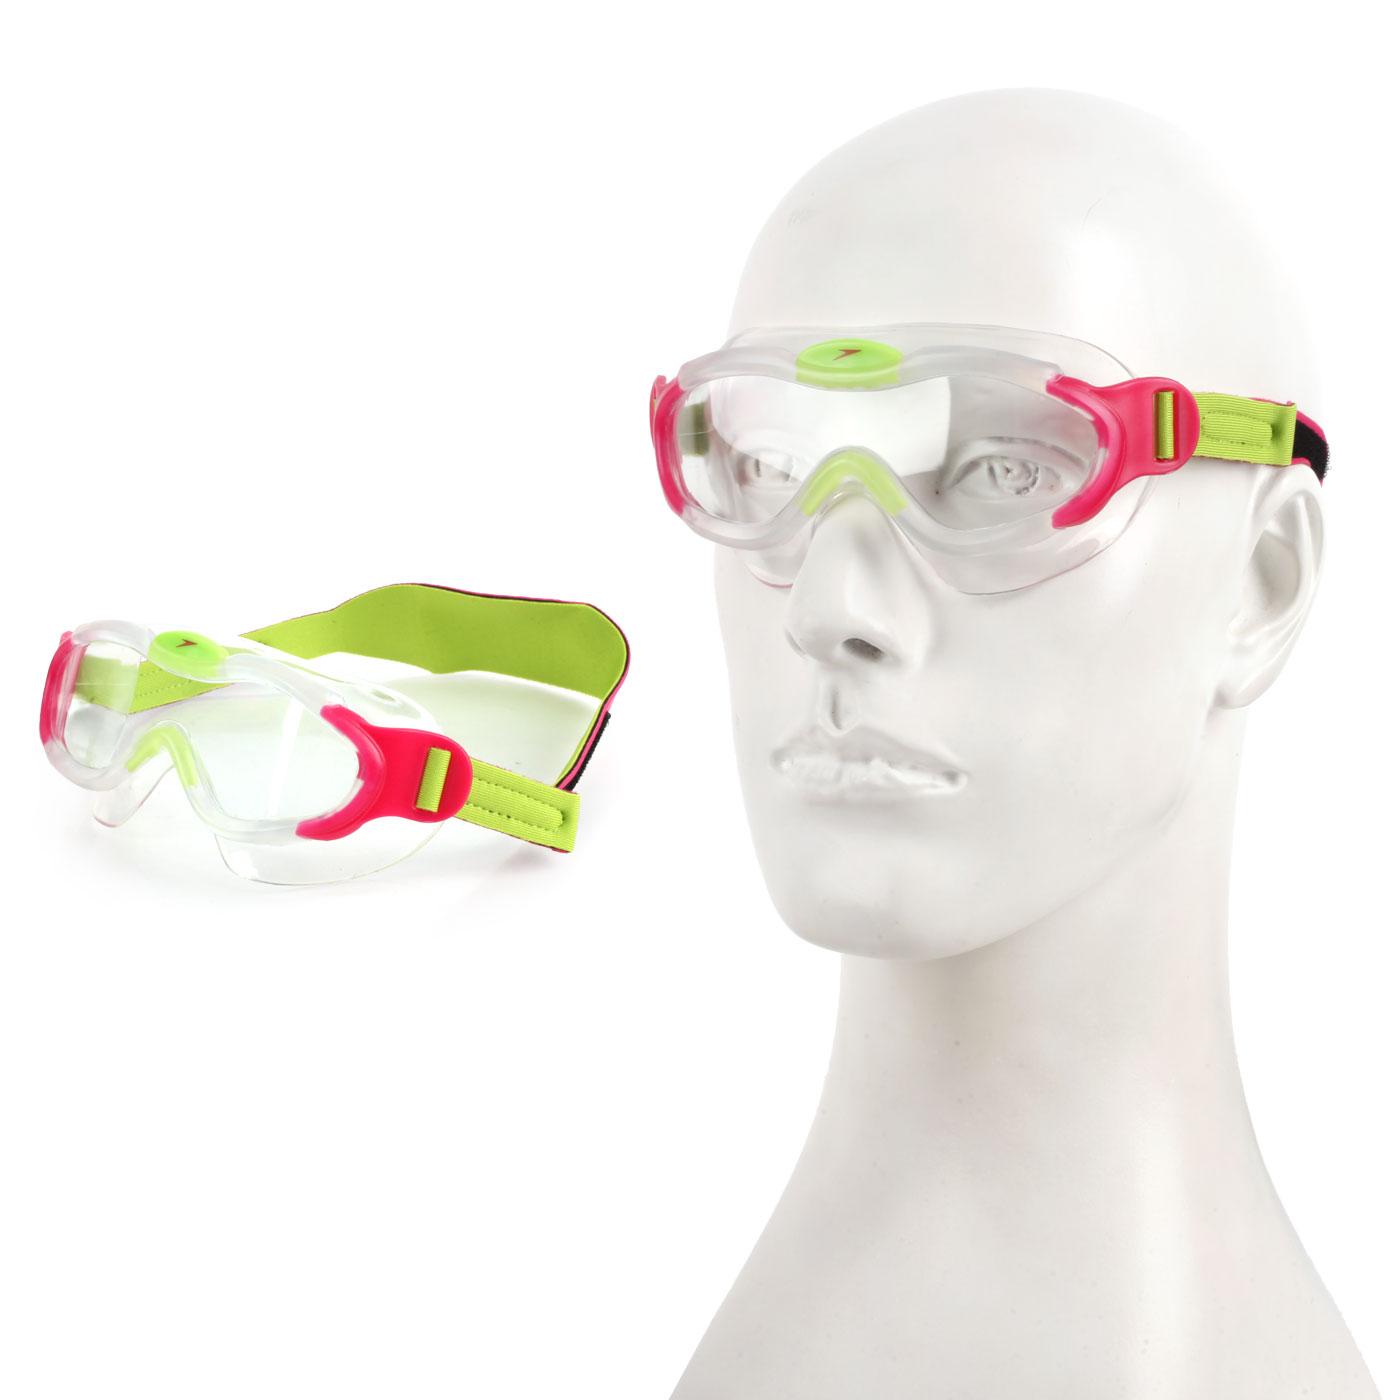 SPEEDO 幼童進階面罩泳鏡 SD8087638028N - 桃紅螢光綠